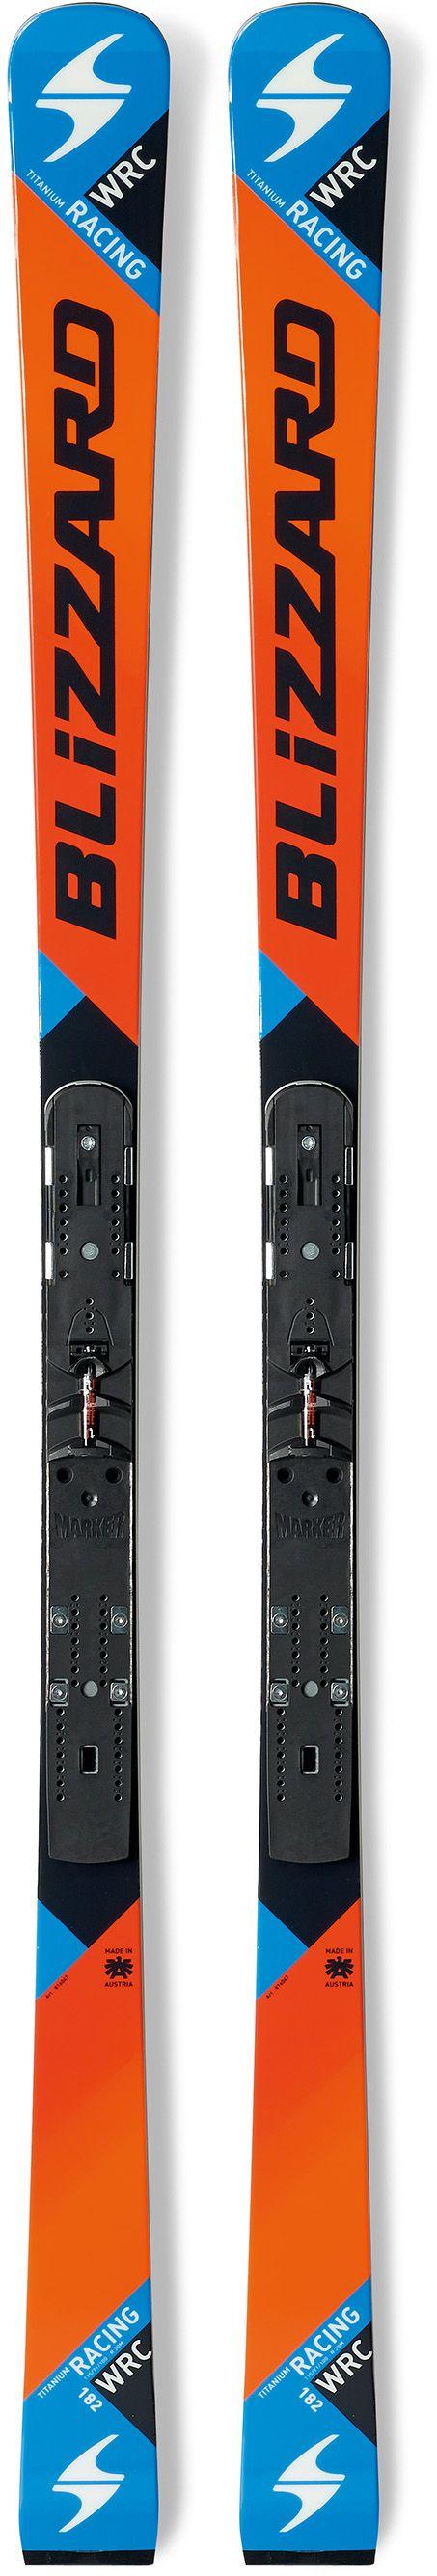 Горные лыжи Blizzard 2015-16 WRC RACING WC-PISTON(FLAT+PLT) ORANGE-BLACK-BLUE